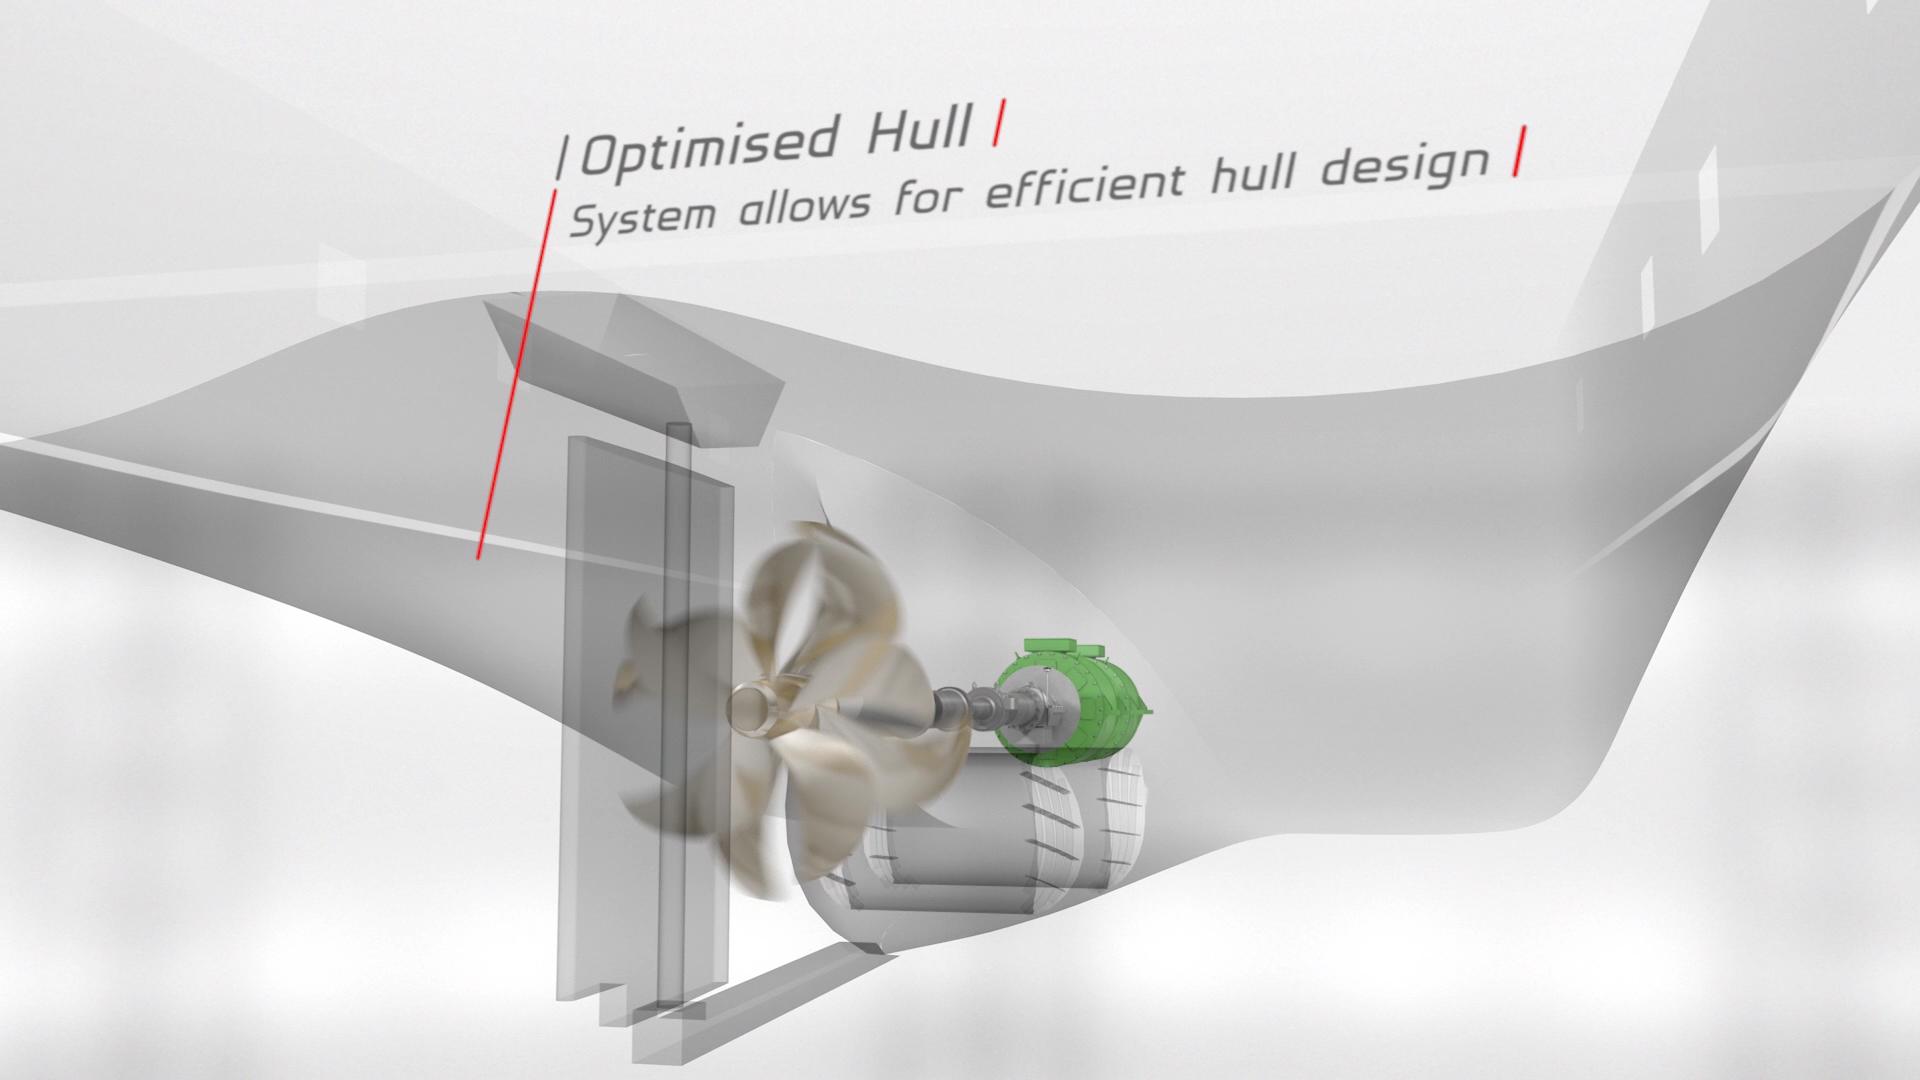 Brunvoll CRP Contra Rotating Propeller in hull design